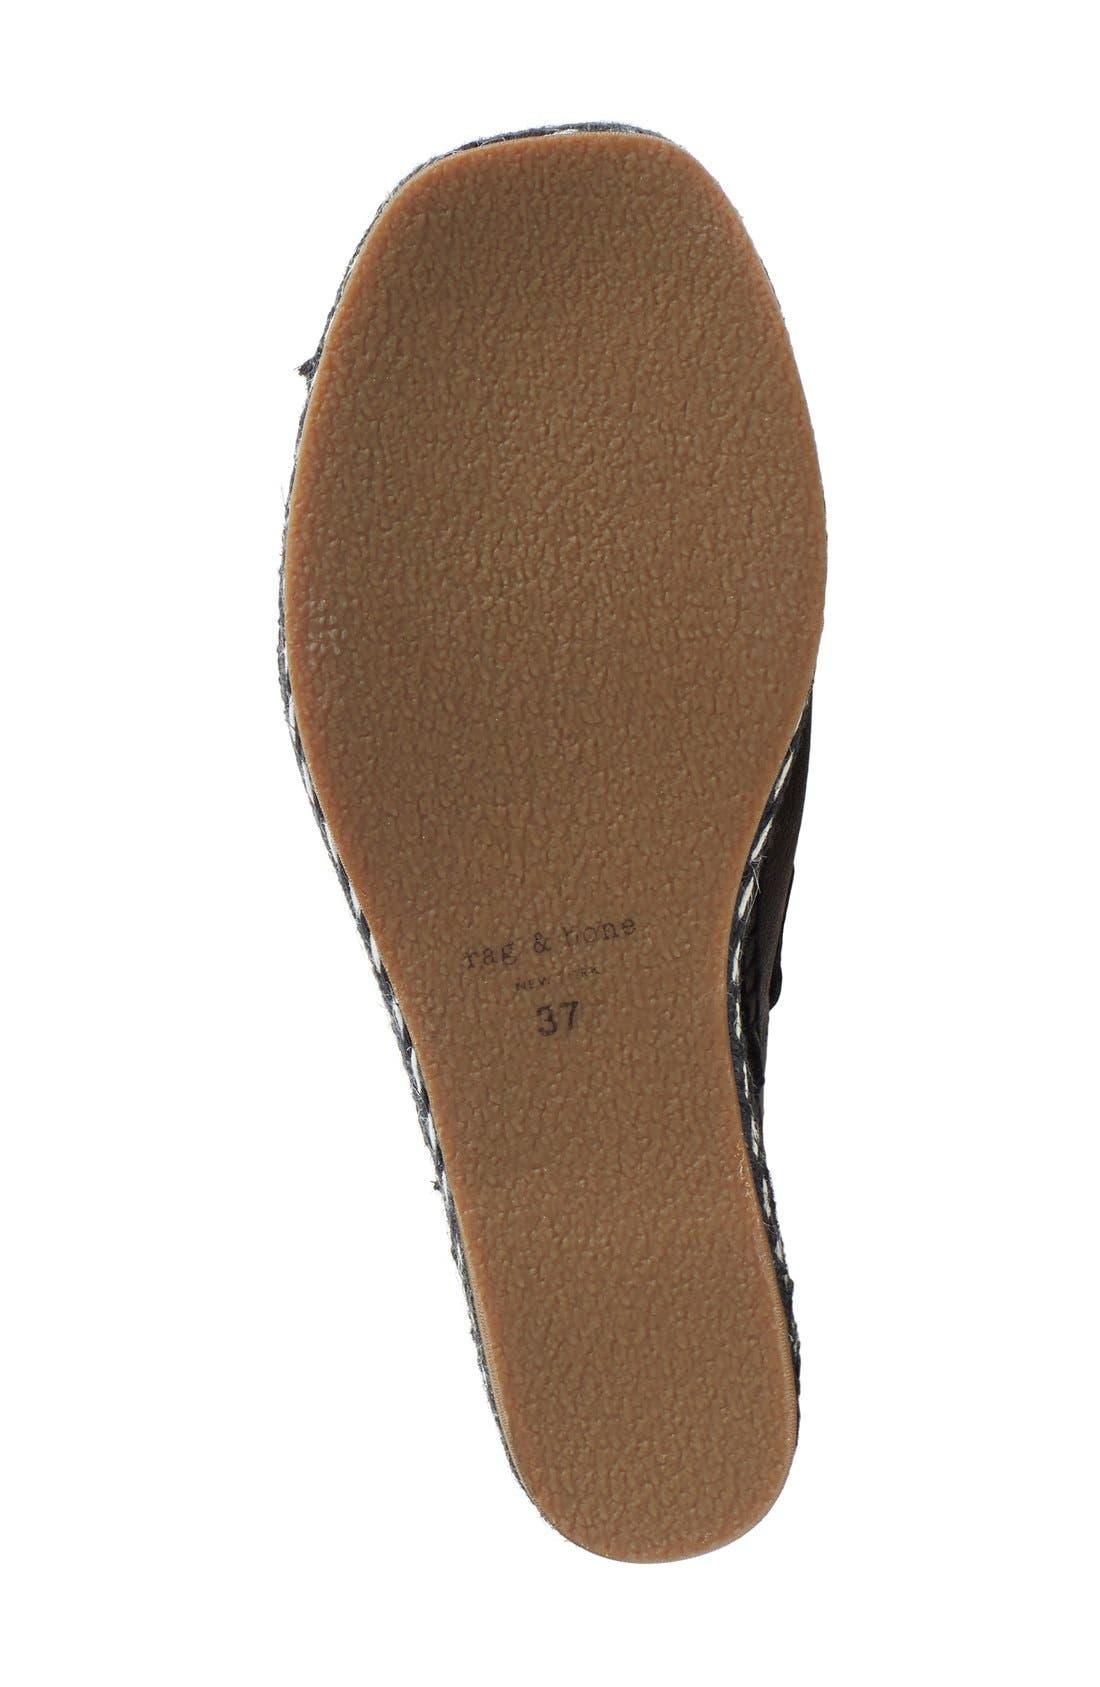 RAG & BONE, 'Sayre II' Espadrille Wedge Sandal, Alternate thumbnail 2, color, 001